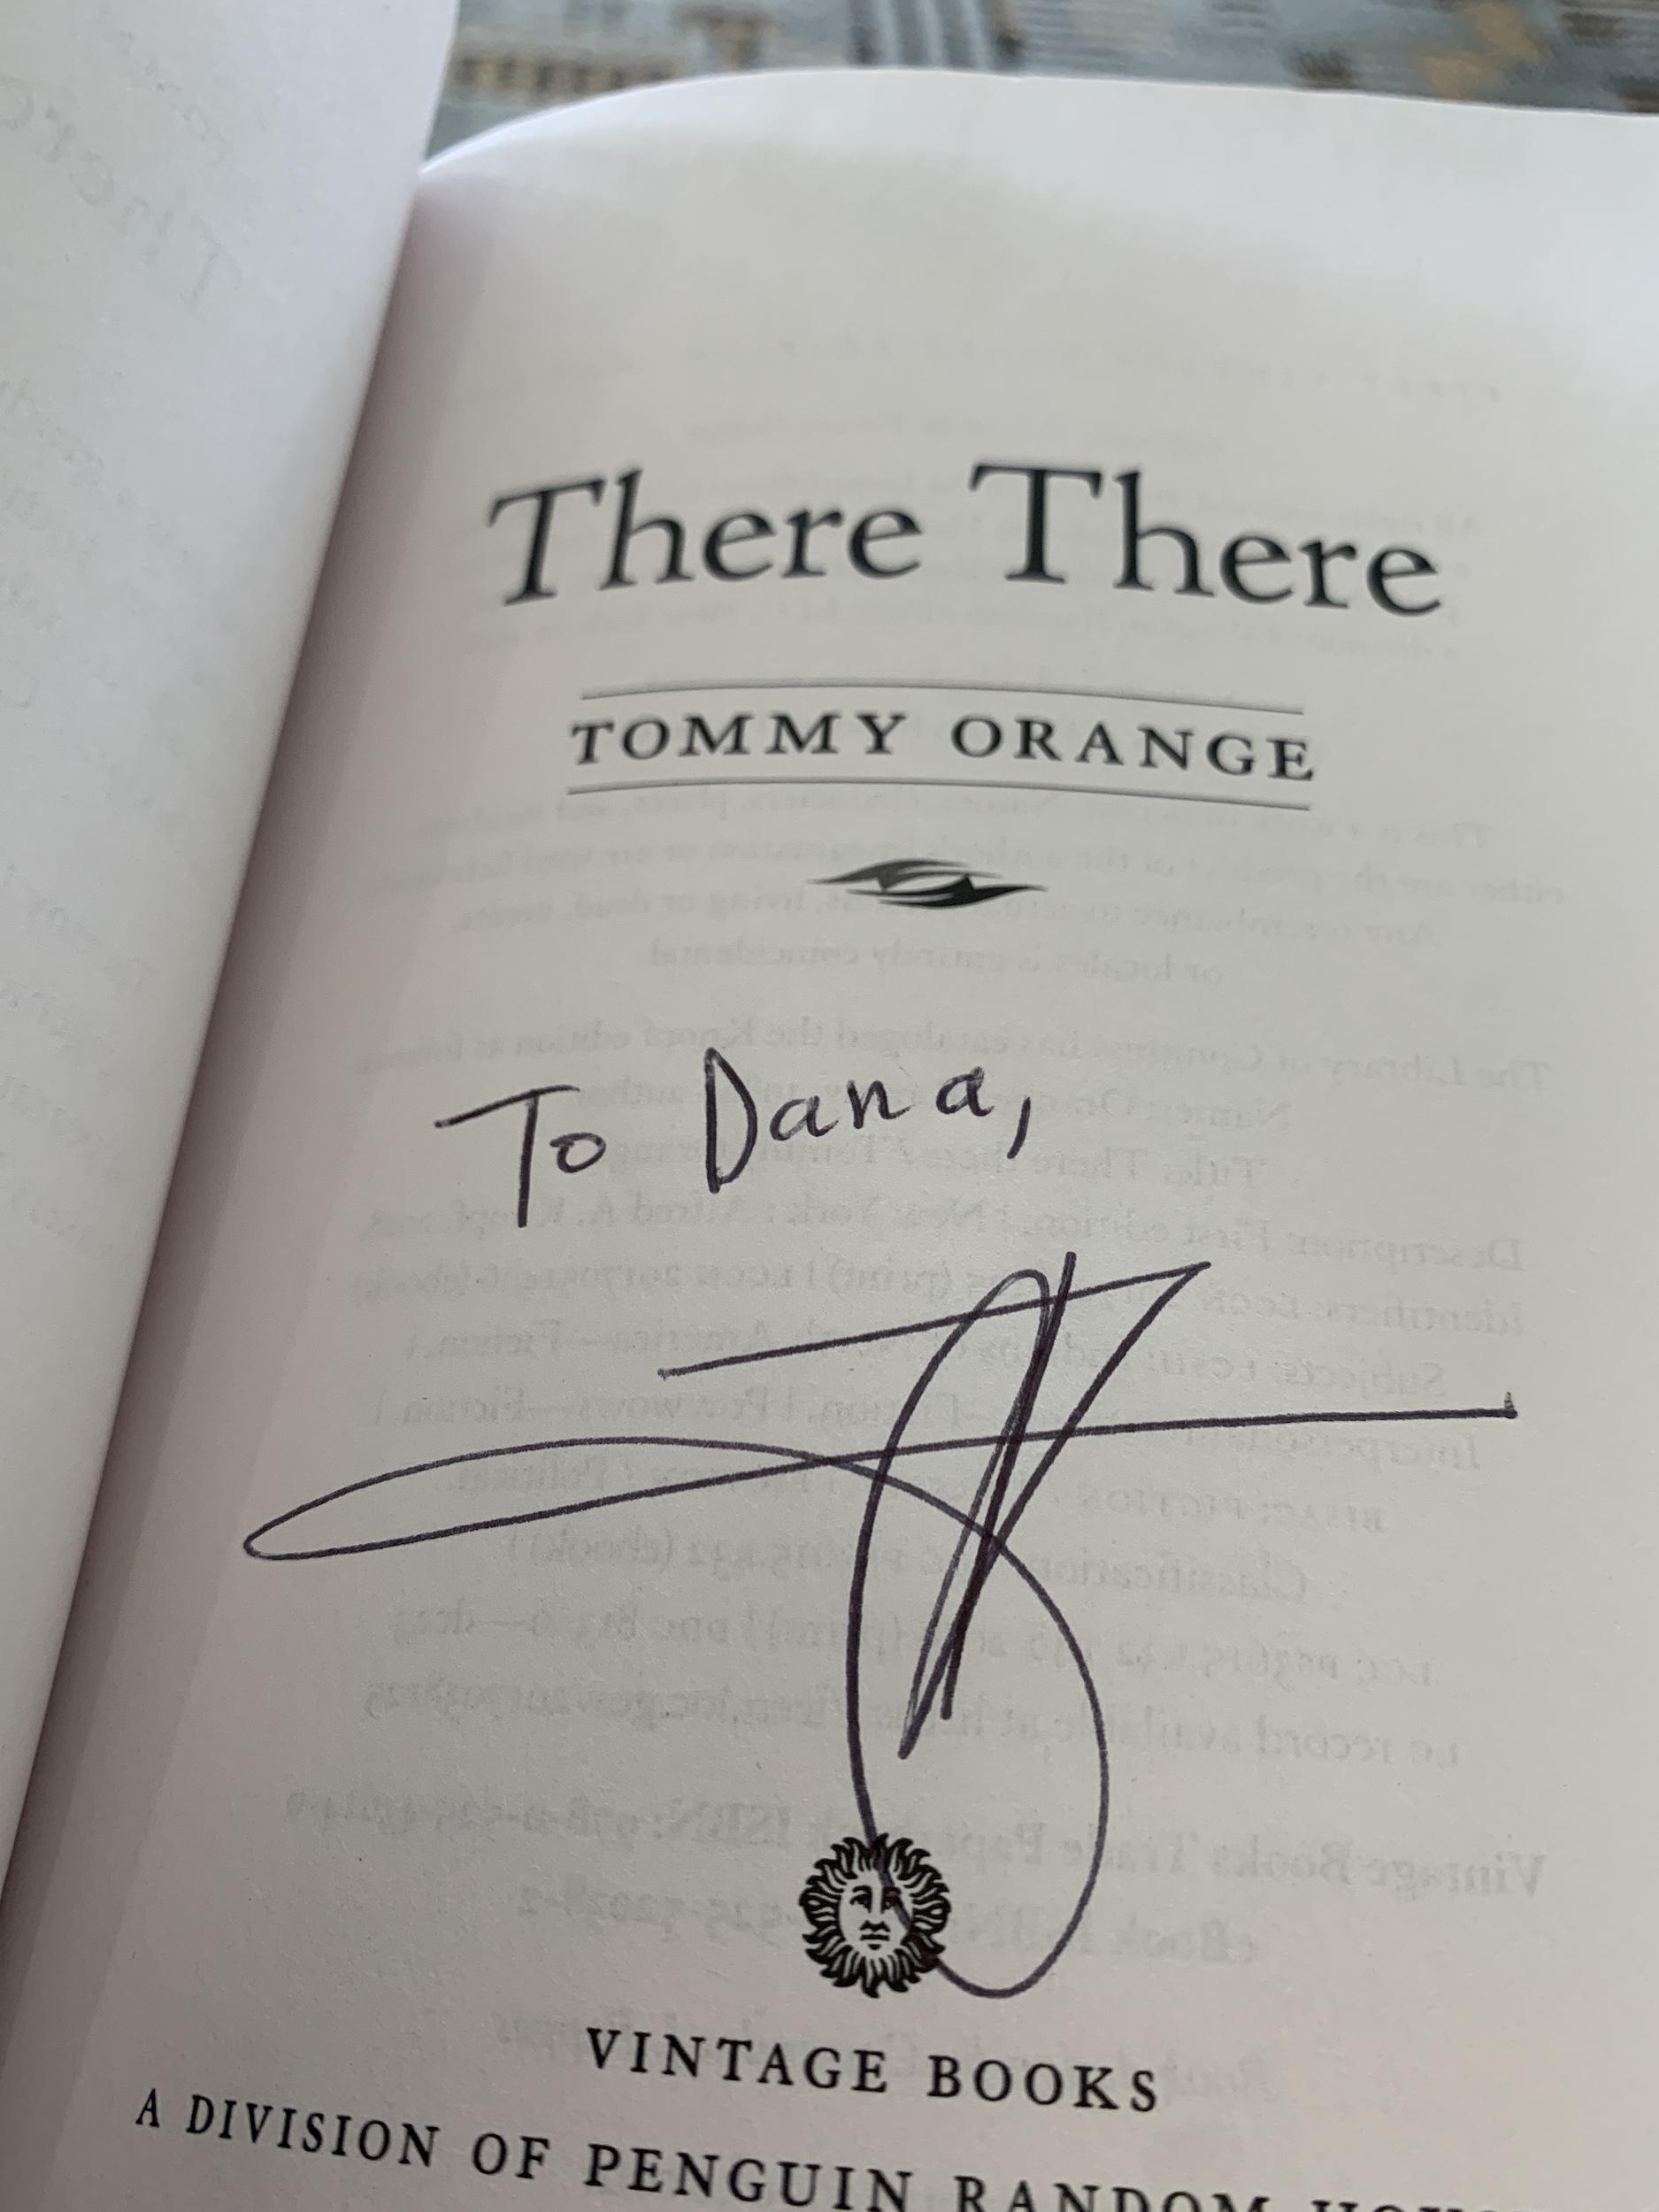 Tommy Orange Book Inscription